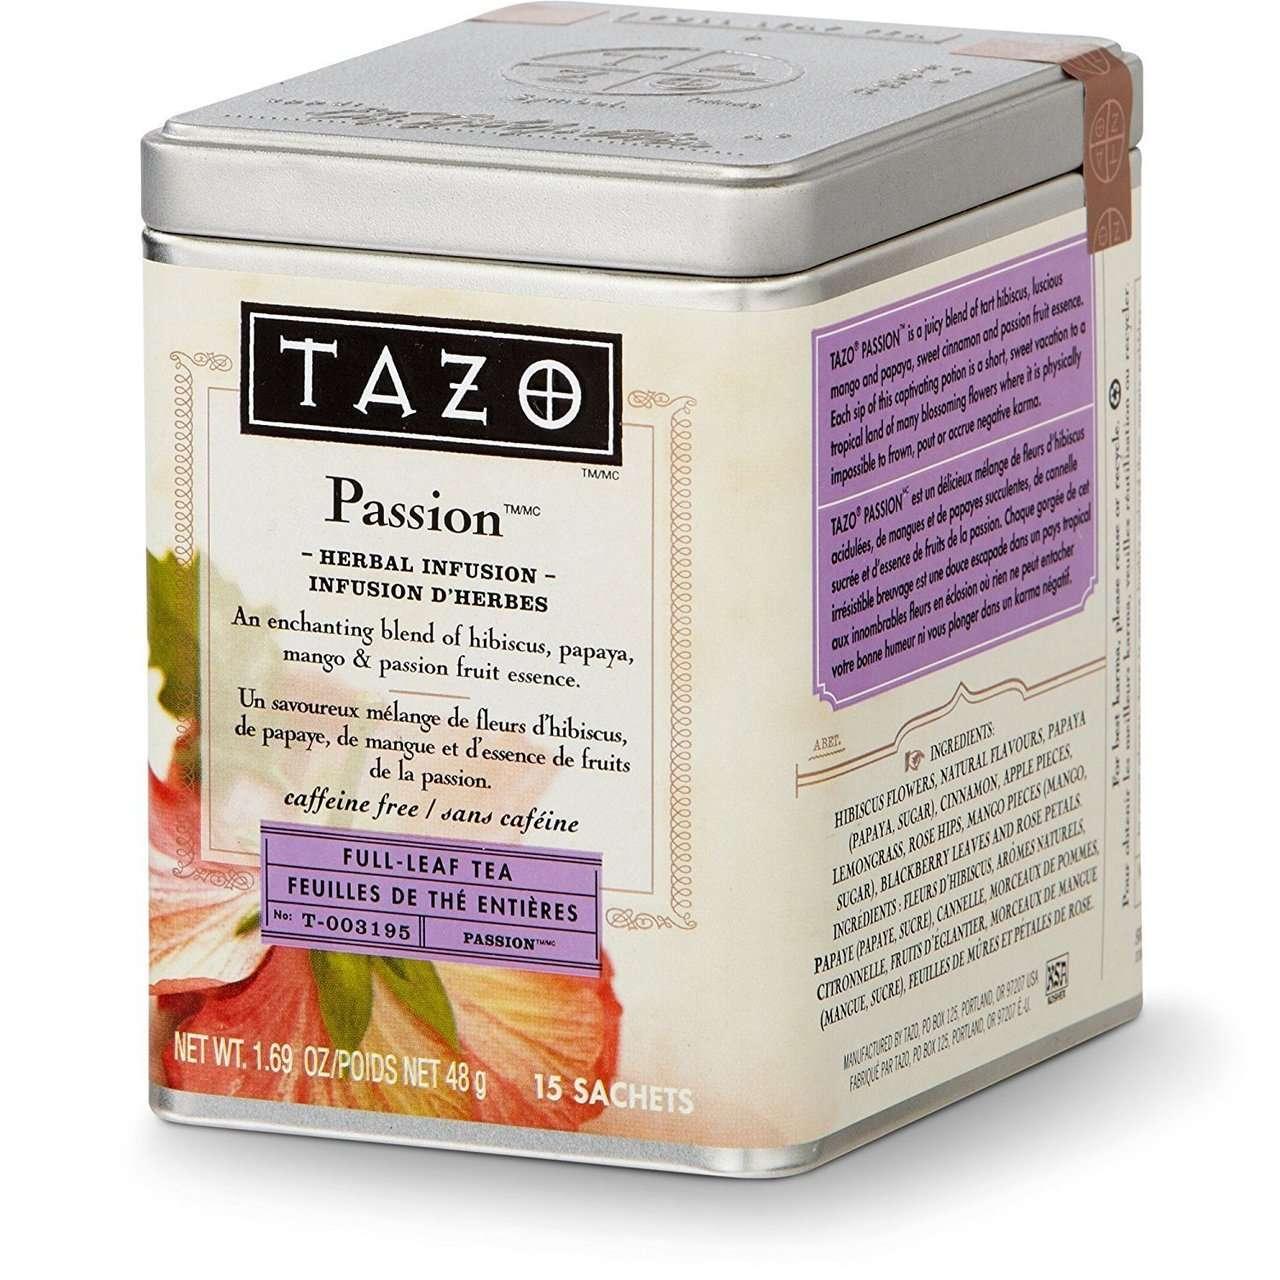 Passion Full Leaf - Tazo Tea - Ratings